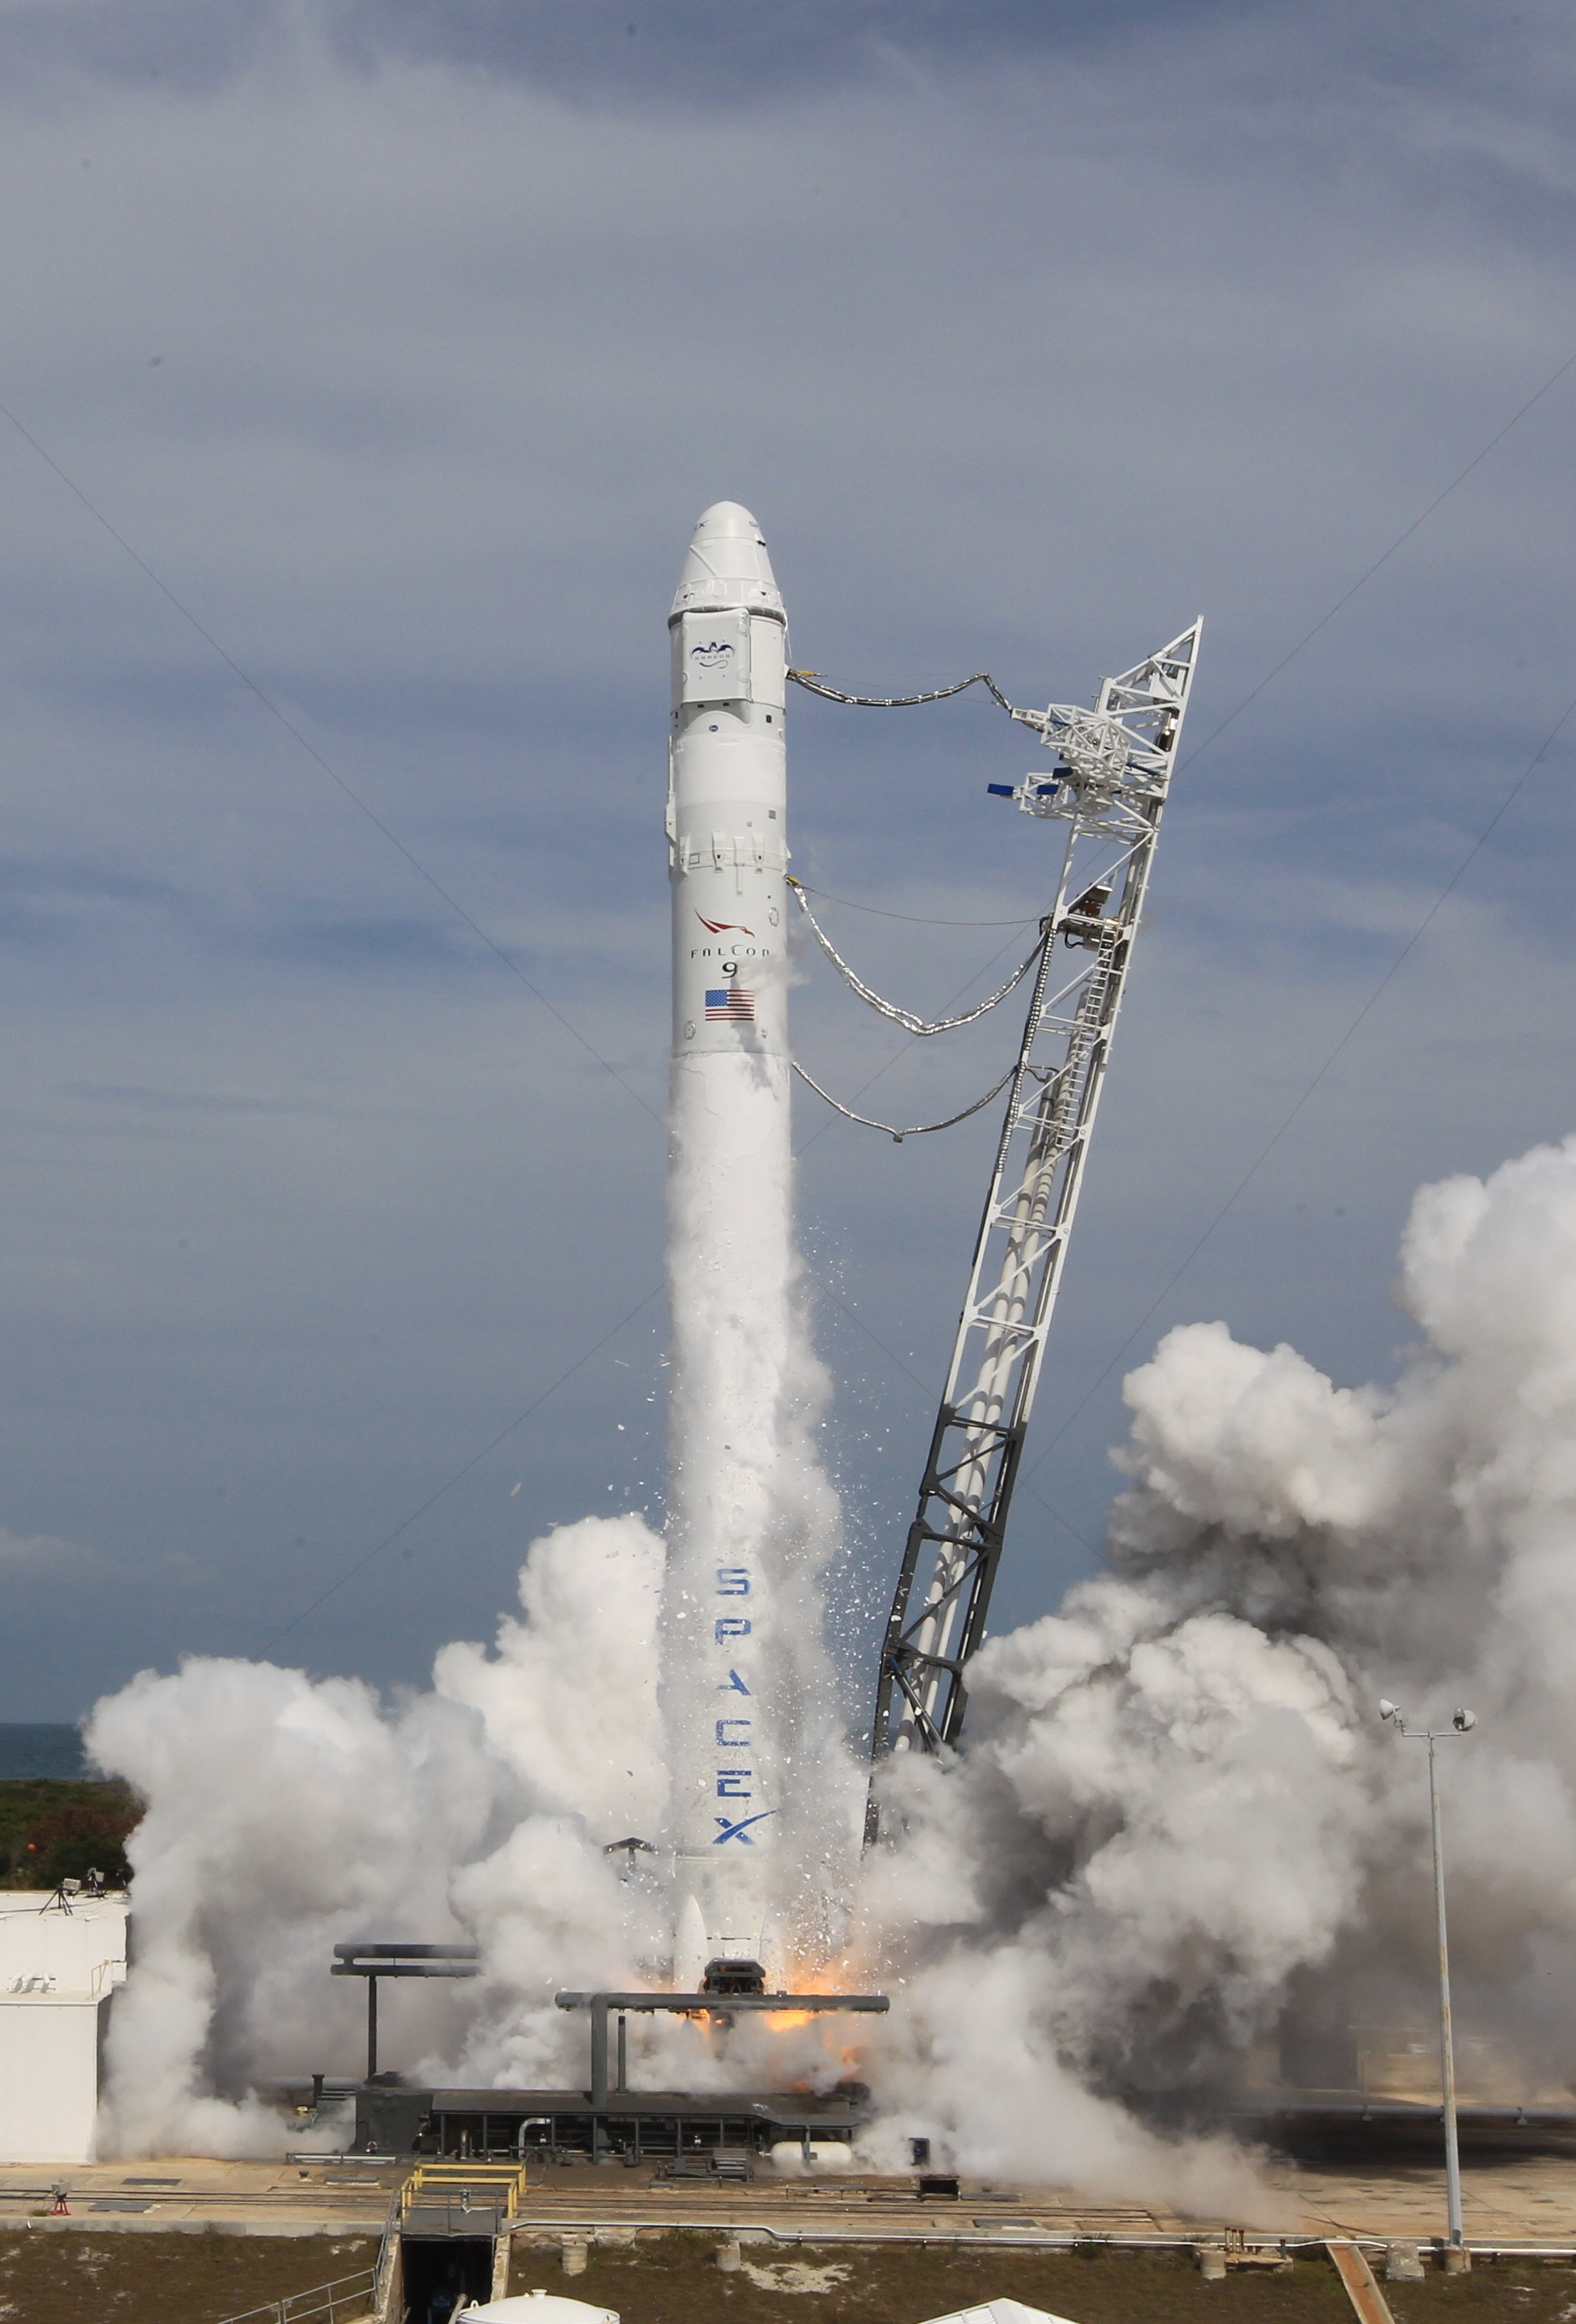 dragon spacex texas launch - photo #9